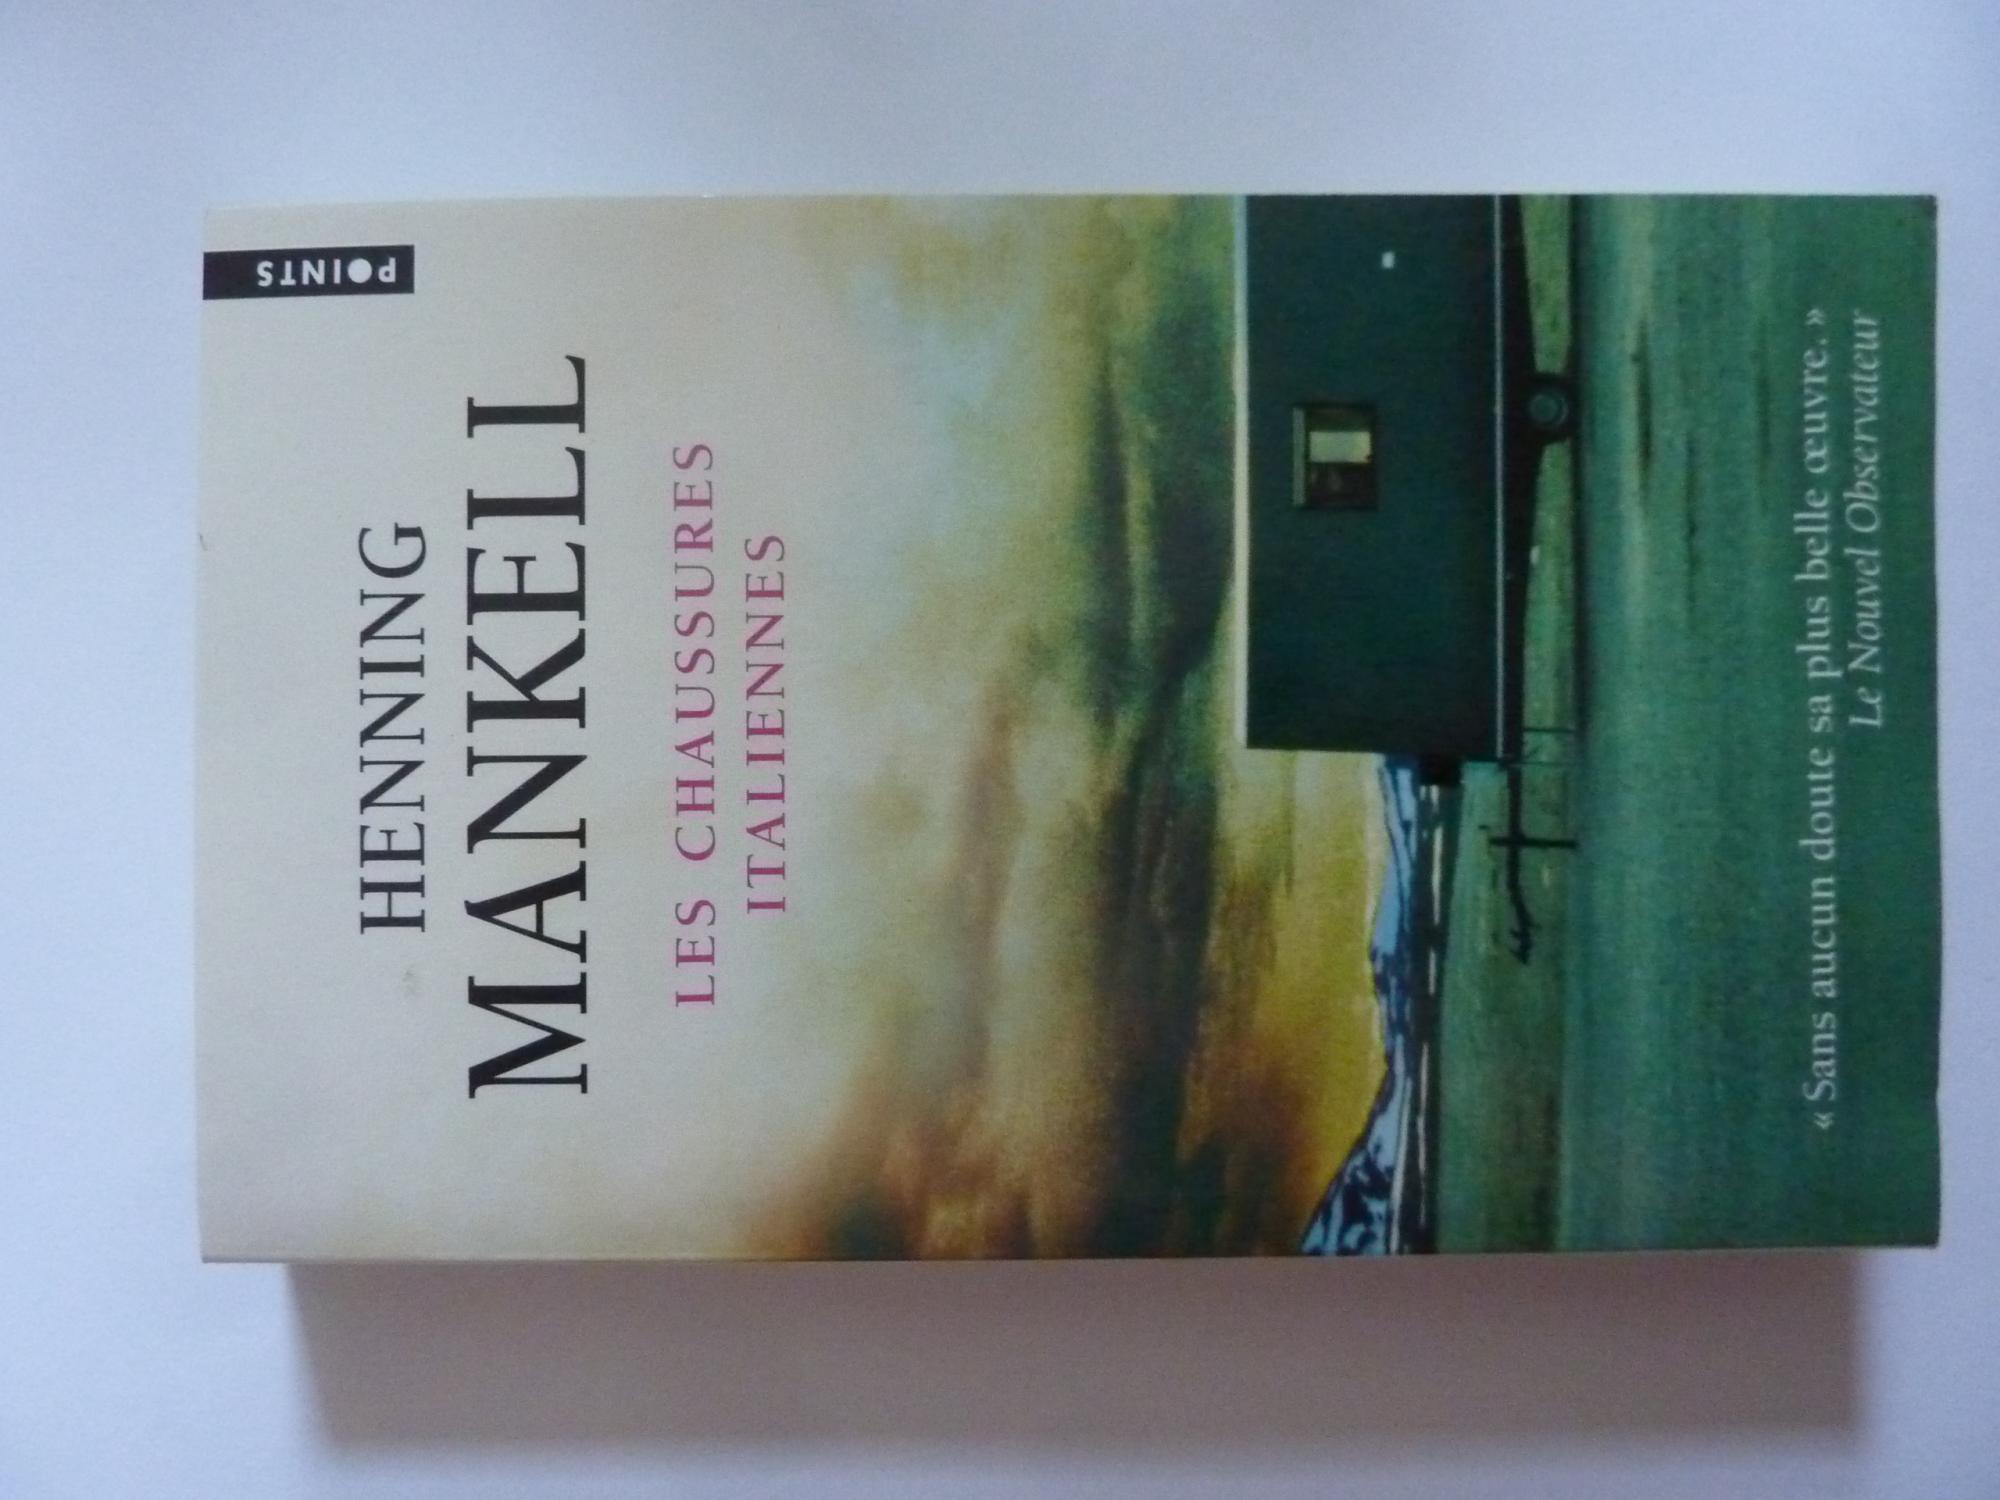 0656092a89f34f LES CHUSSEURS ITALIENNES par Henning Mankell: Edition du Seuil Brossura,  prima edizione - Historia, Regnum et Nobilia